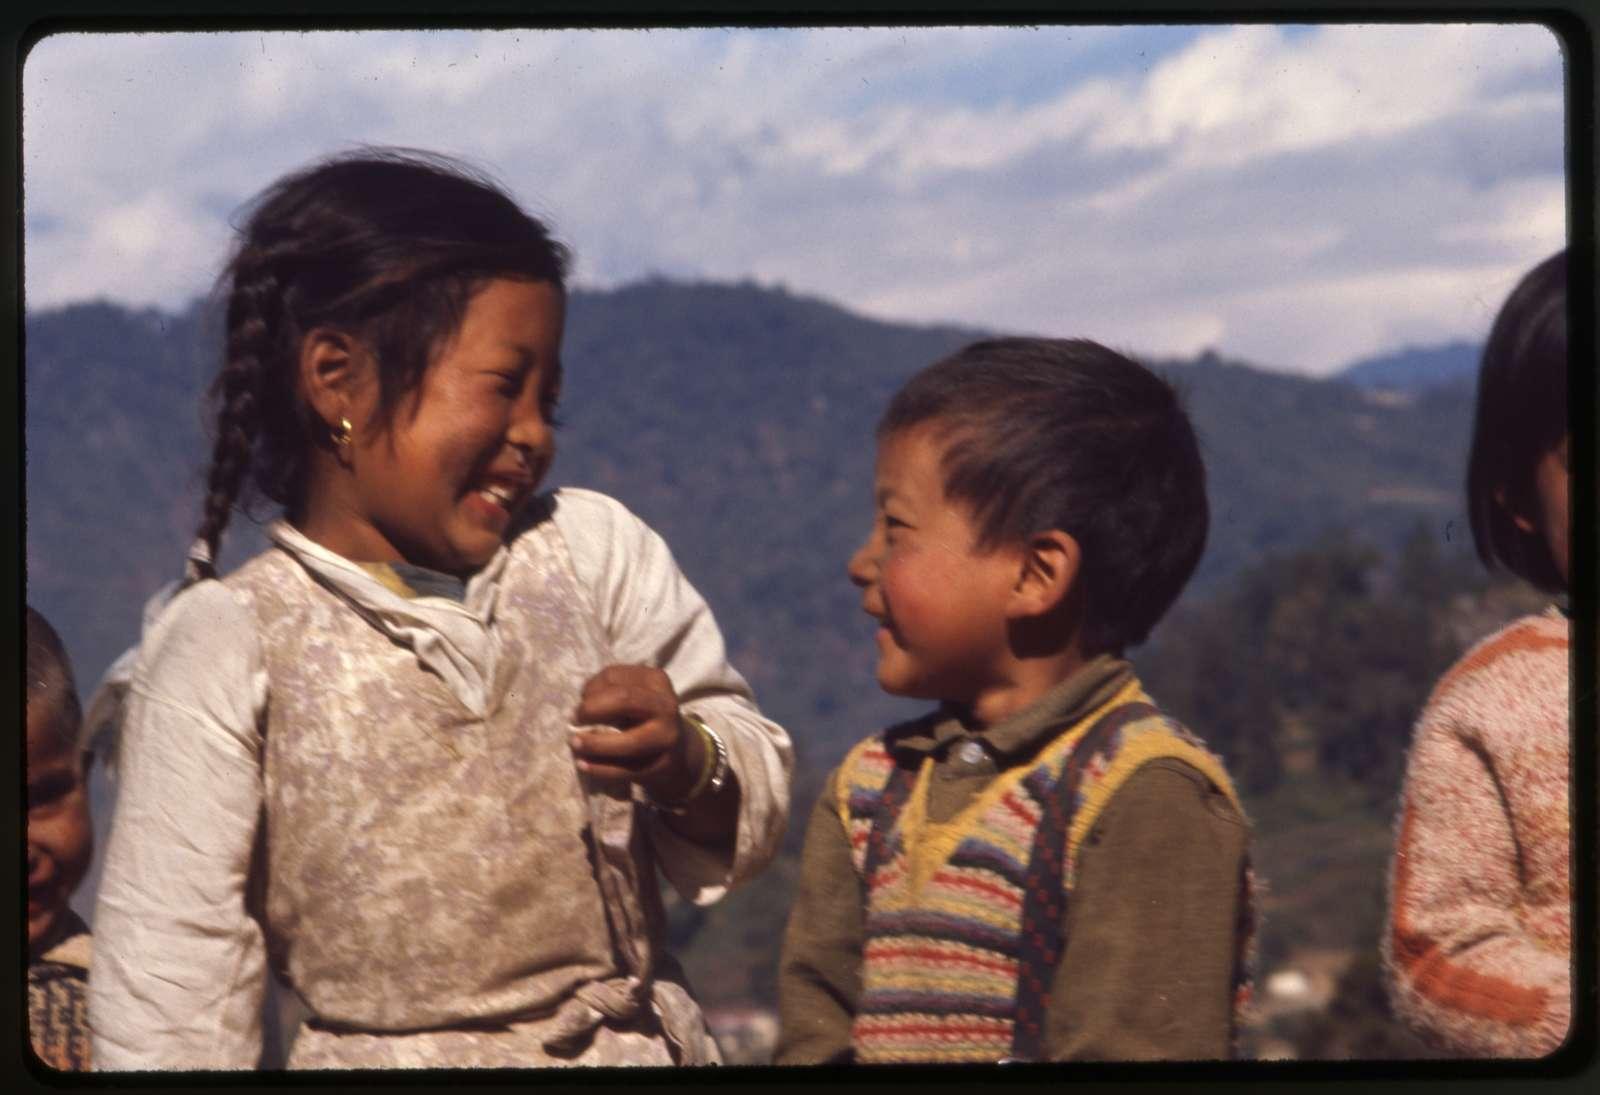 [Smiling schoolchildren in Gangtok, Sikkim]